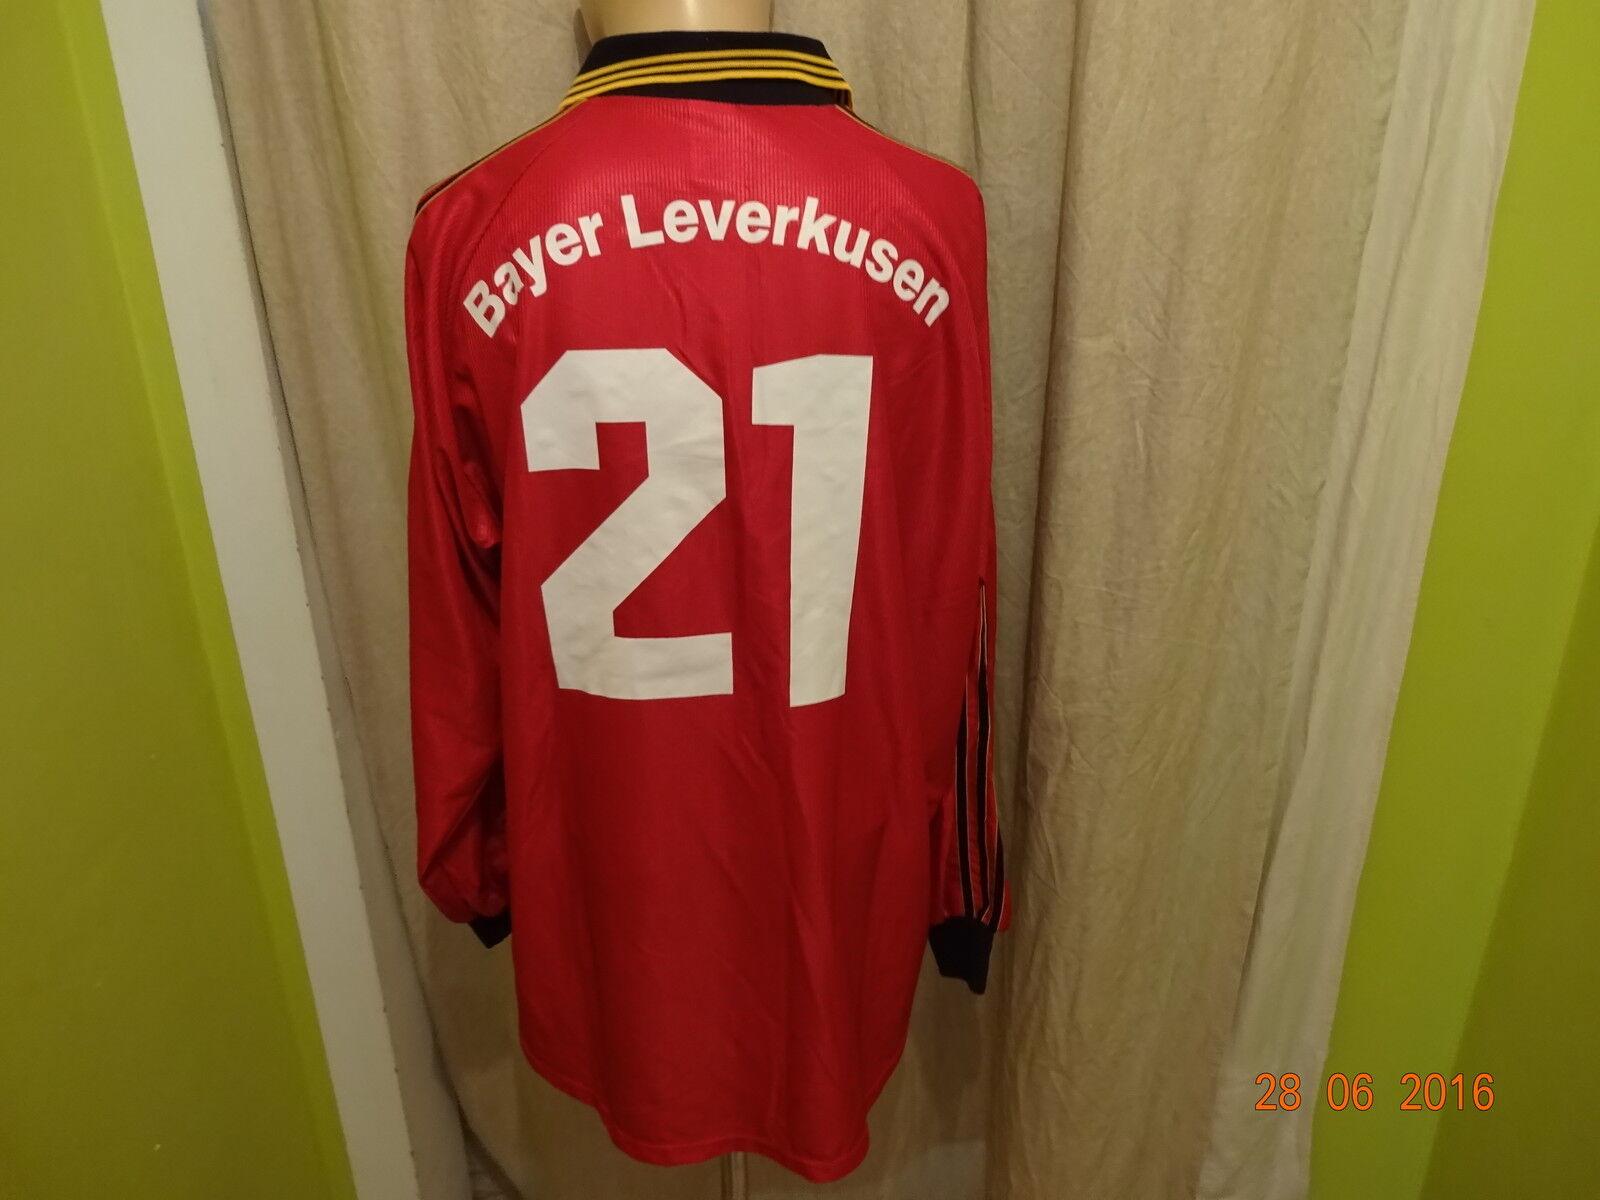 Bayer 04 Leverkusen Adidas Langarm Matchworn Trikot 98 99 99 99  ASPIRIN + Nr.21 Gr.XL    Verschiedene Stile  2a7eec